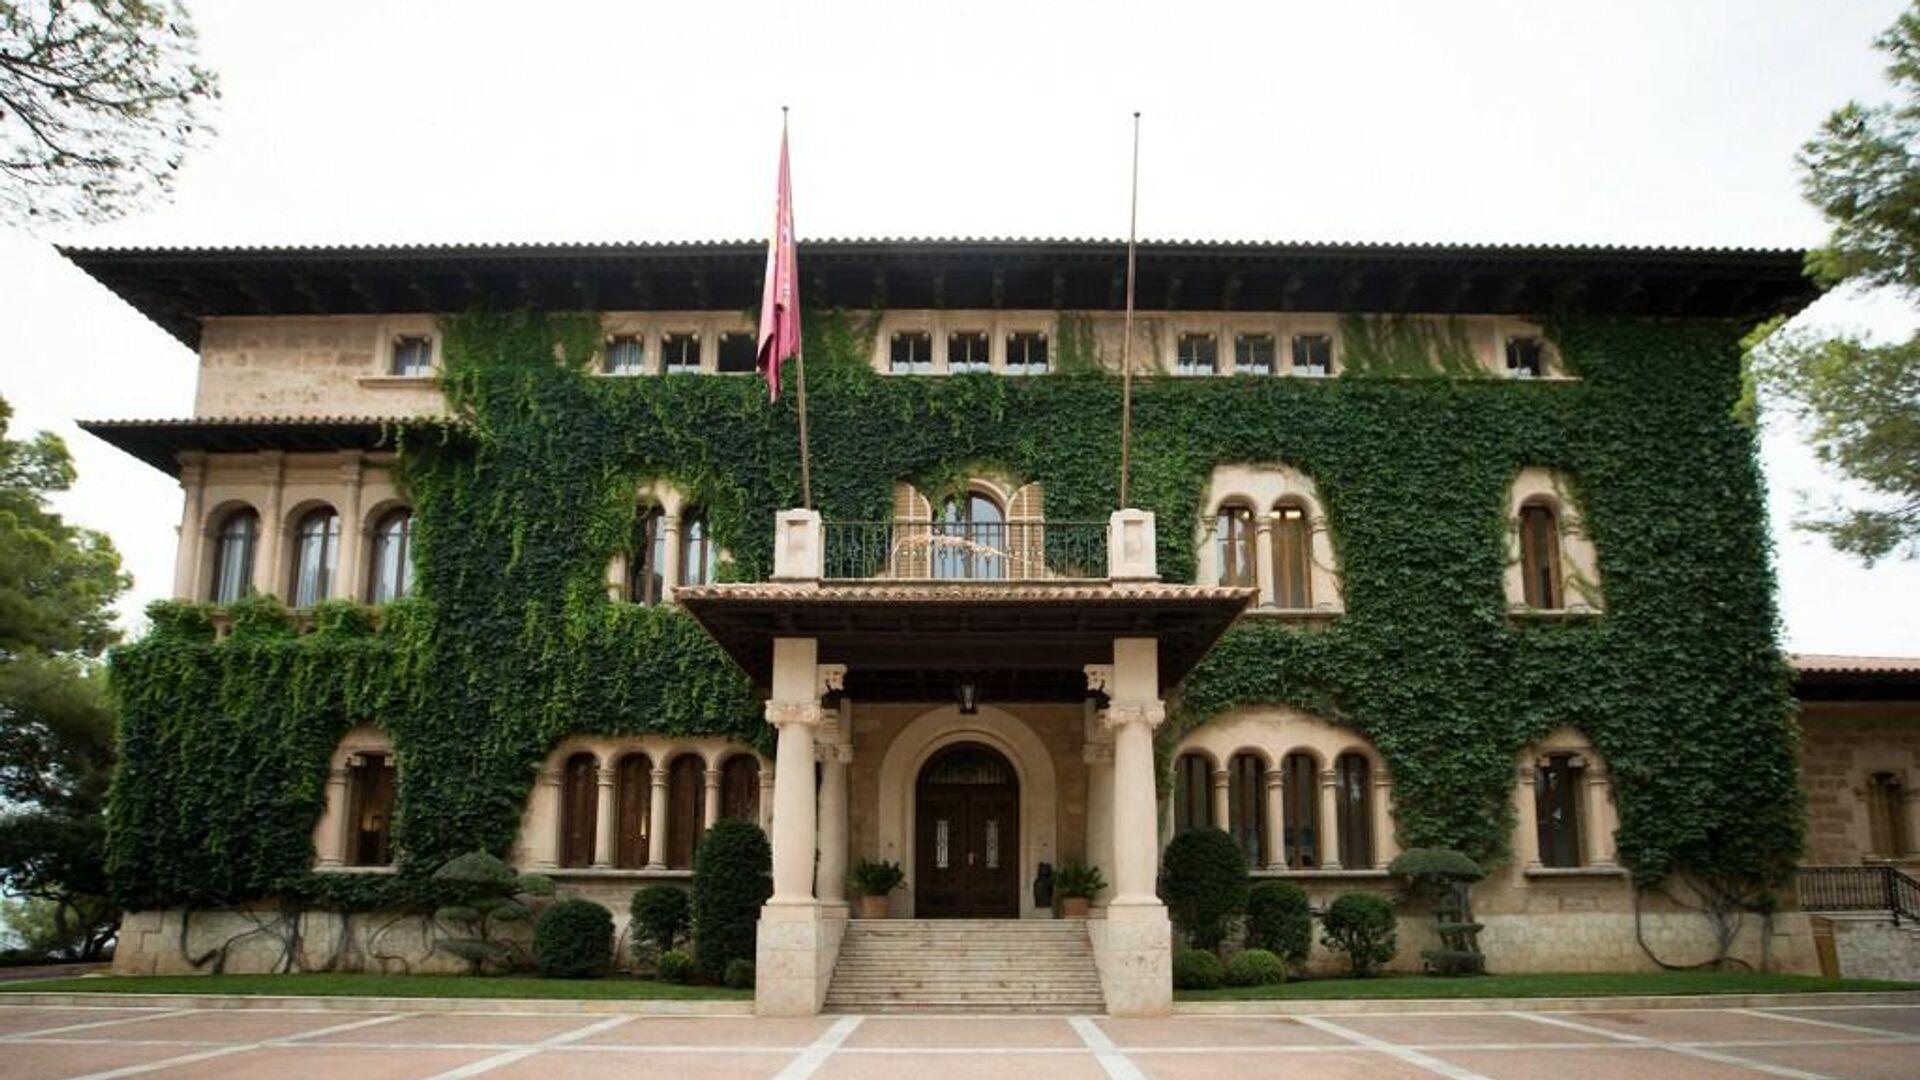 Palacio de Marivent, en Palma de Mallorca - Sputnik Mundo, 1920, 10.08.2021